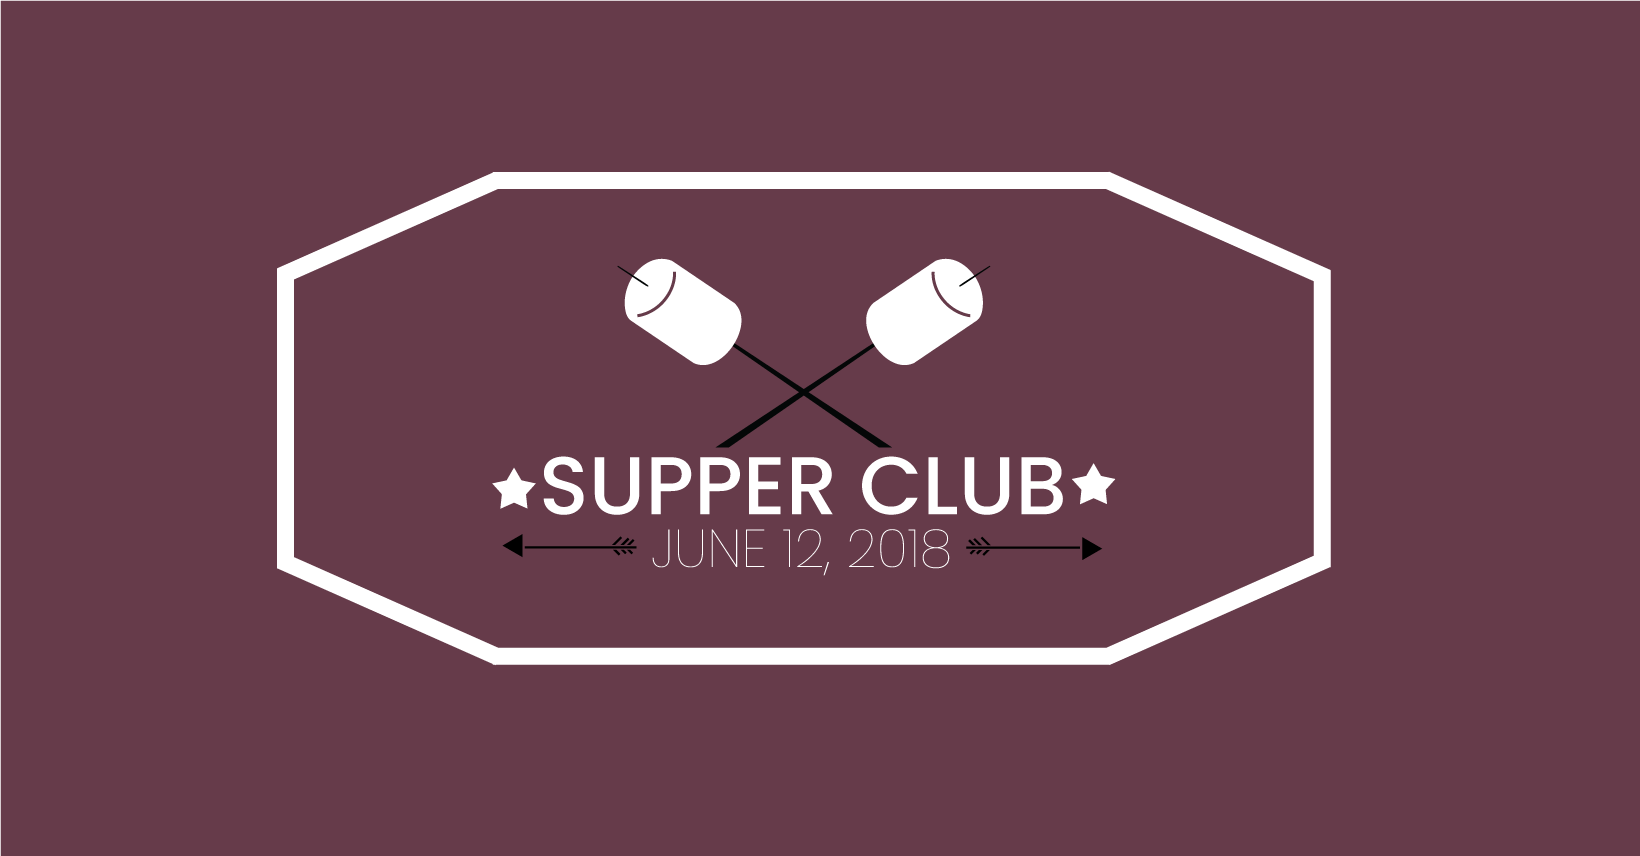 supper-club-6.12.png